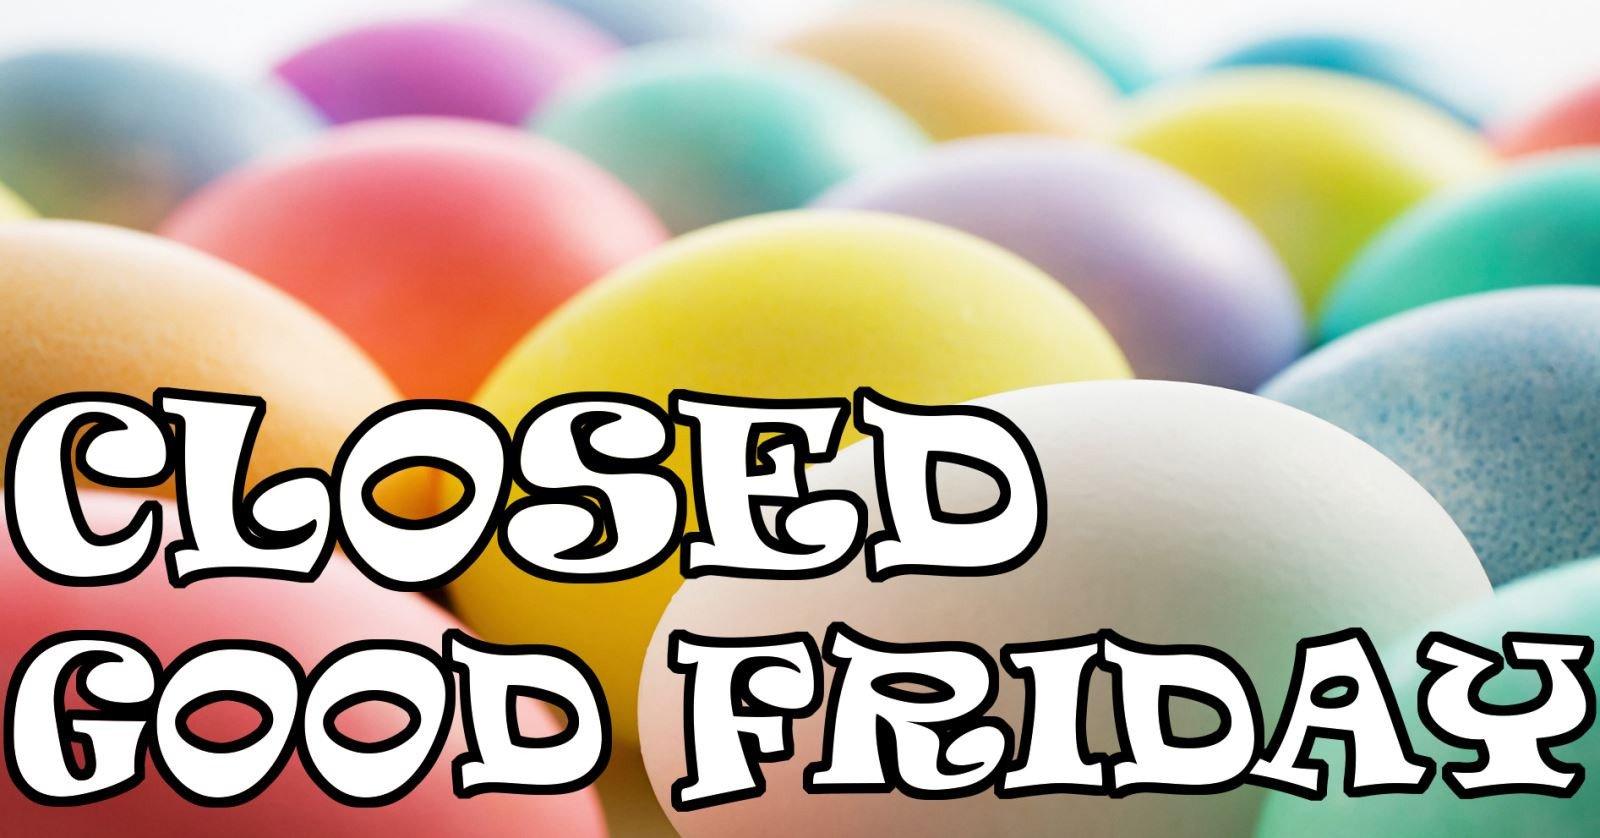 Closed Good Friday Sign News